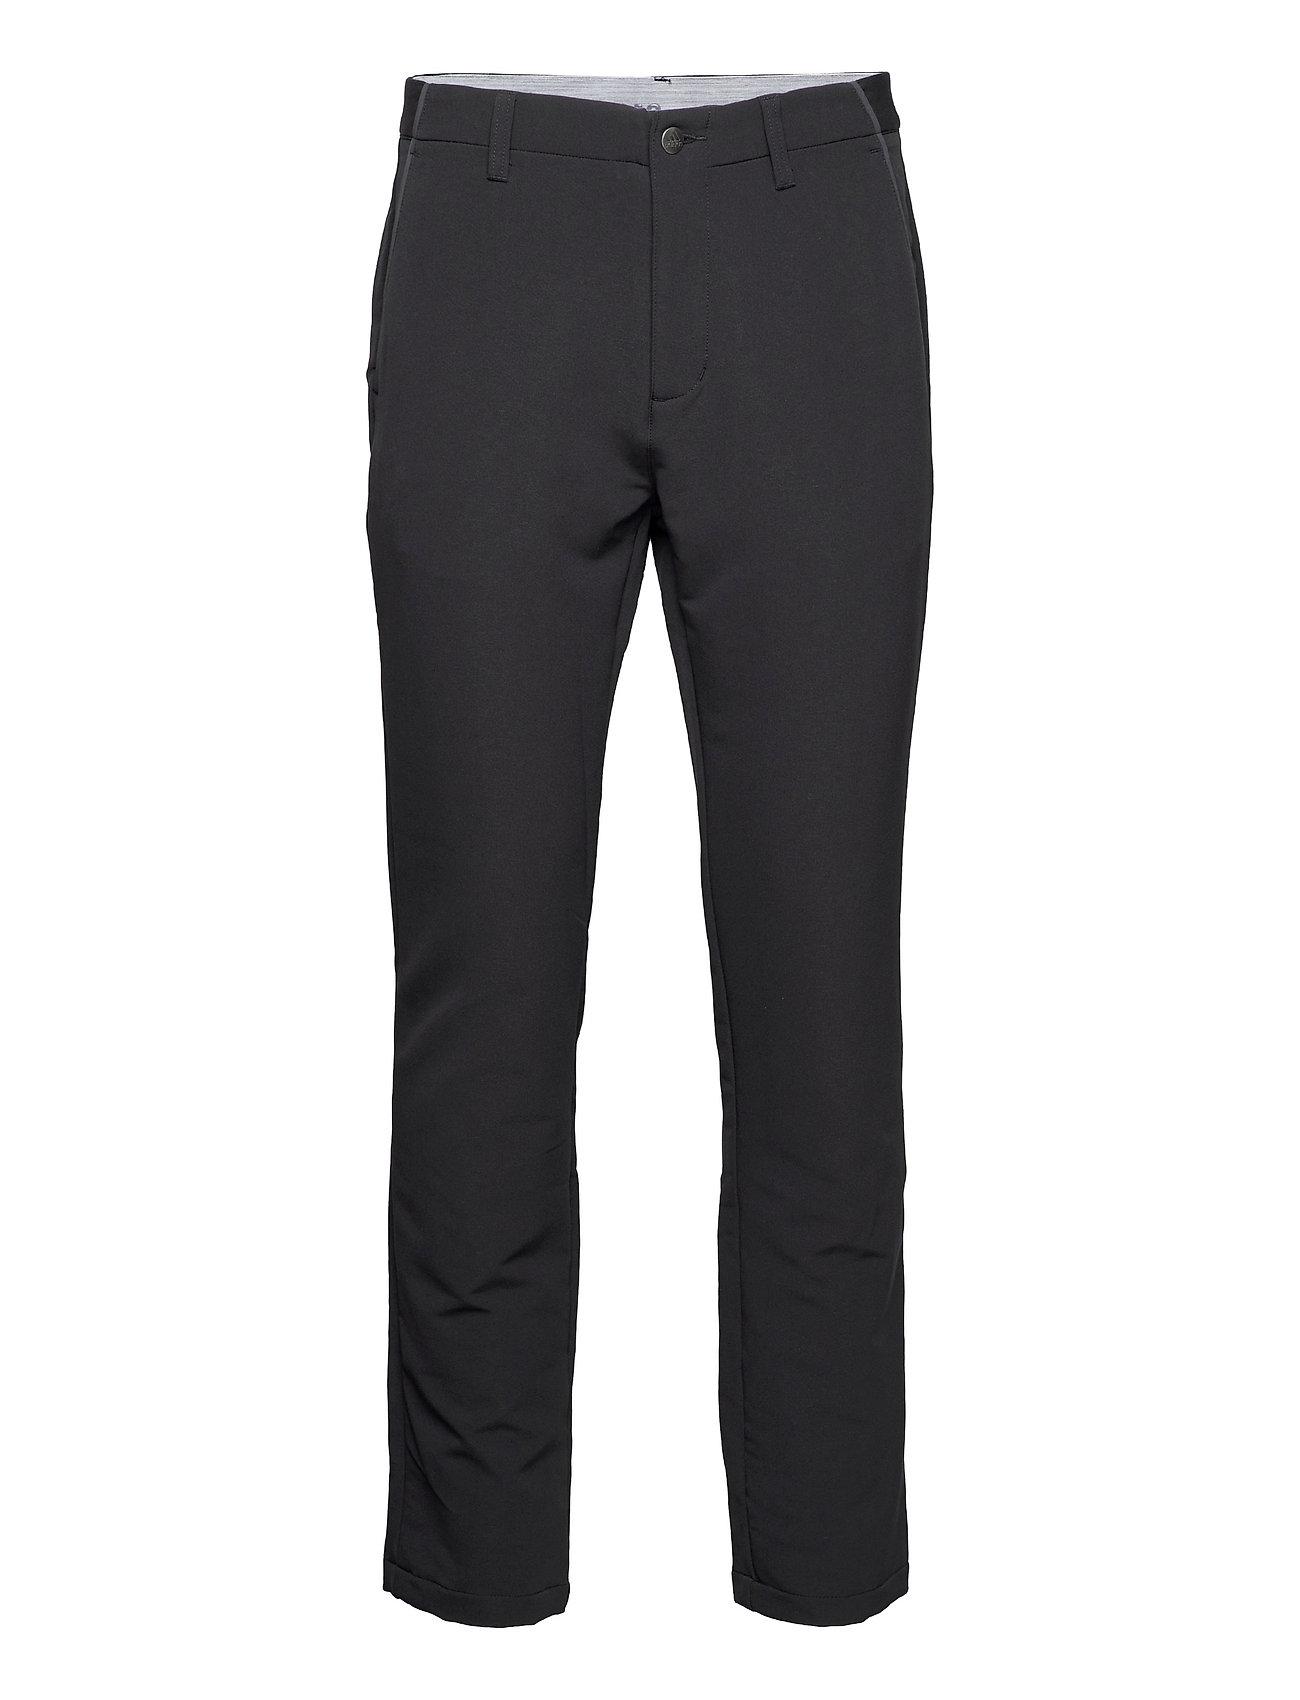 Fallweight Pnt Sport Pants Sort Adidas Golf